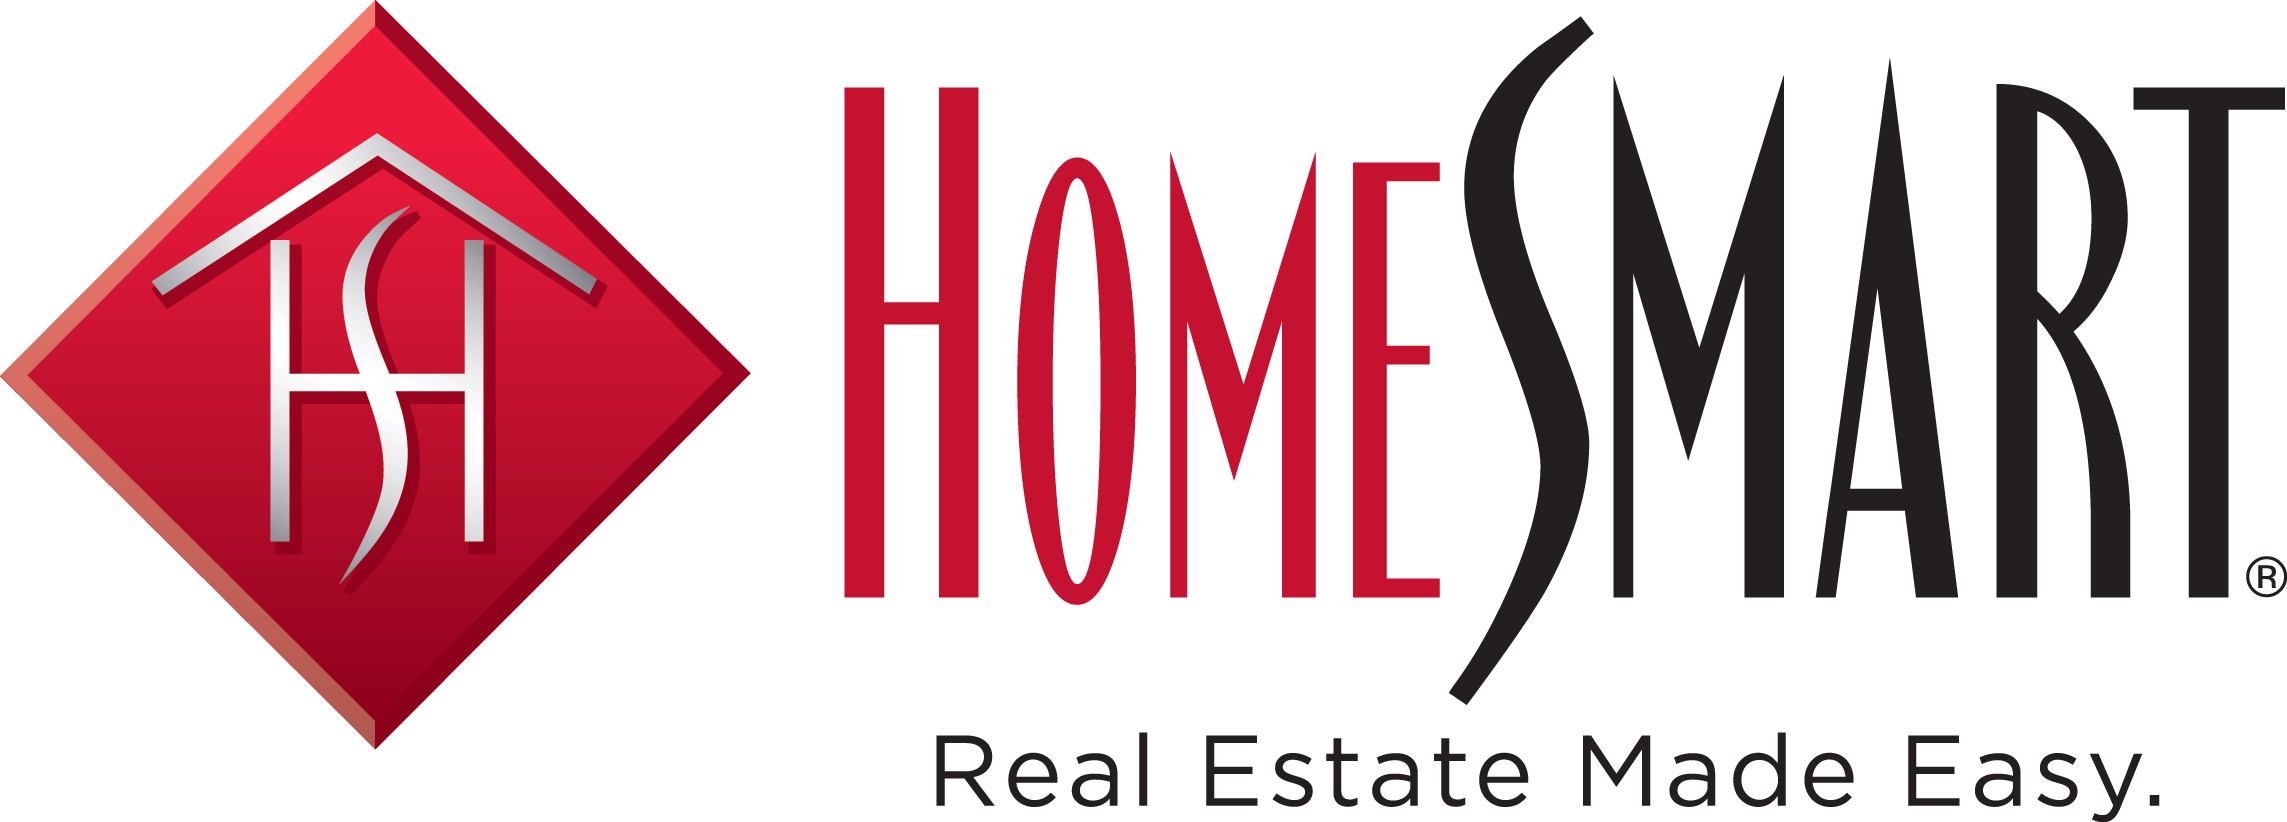 home smart market